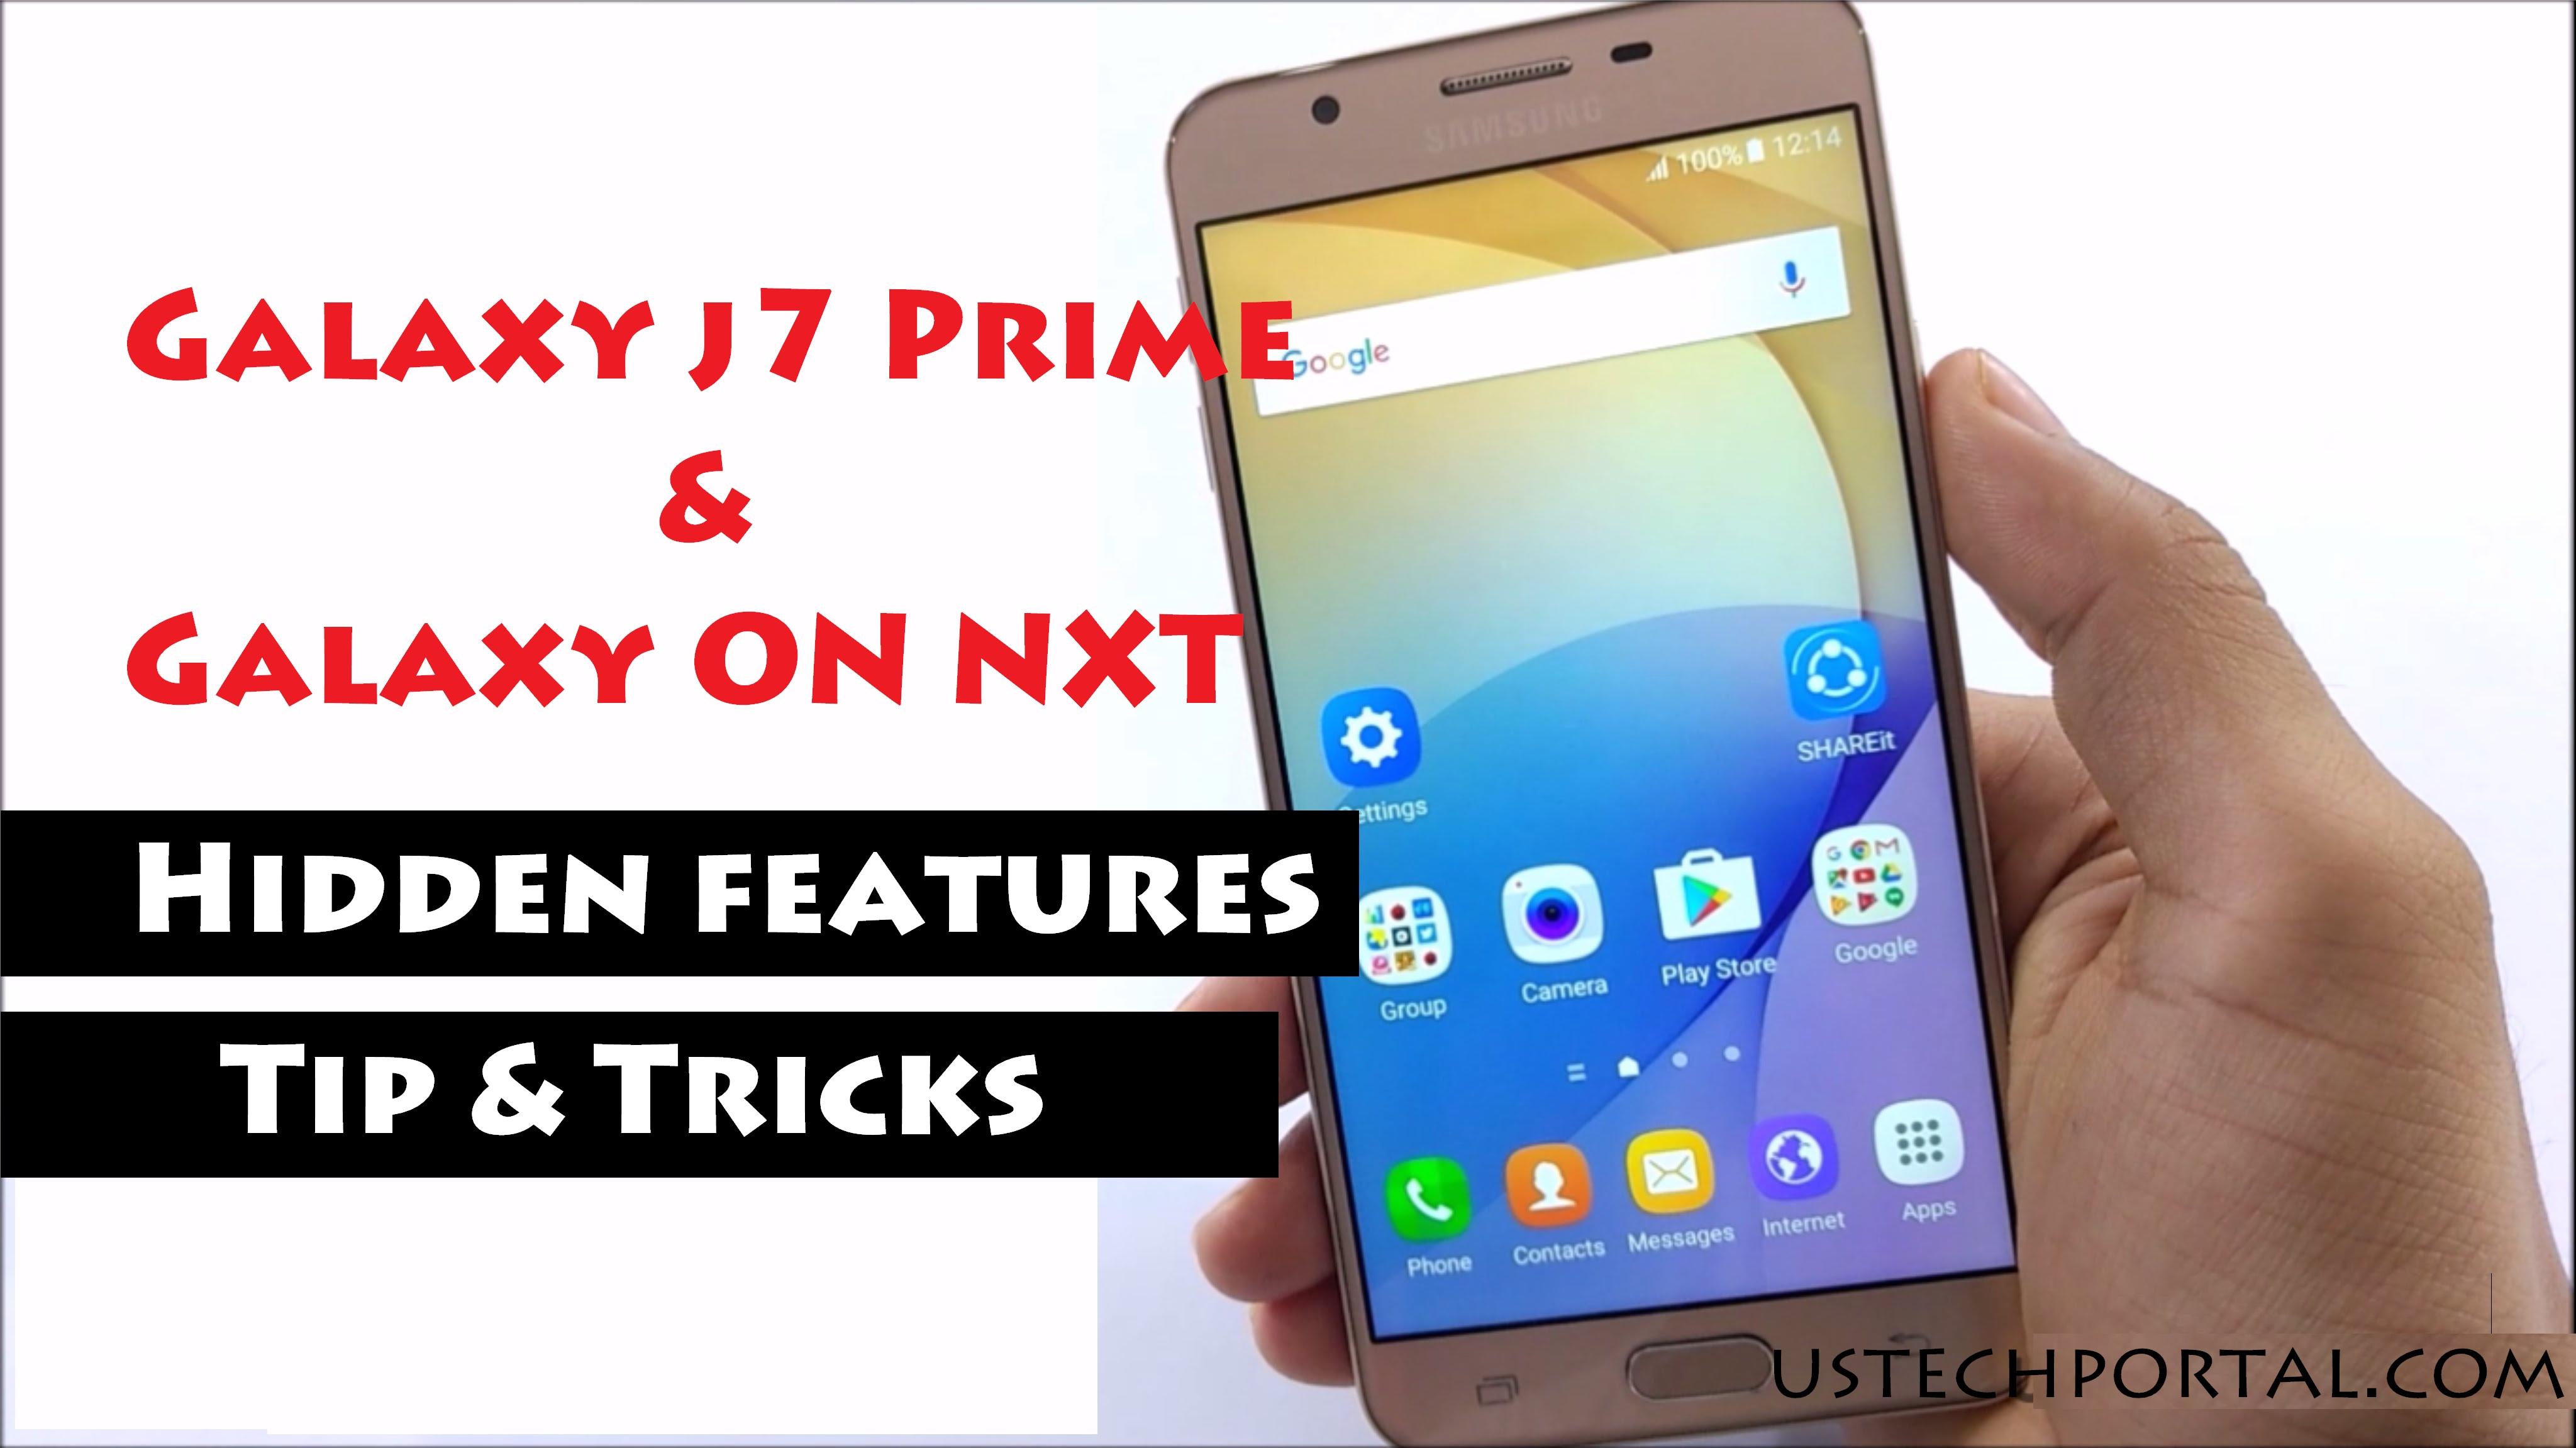 Samsung Galaxy J7 Prime -Galaxy On Nxt Hidden Features - Tips - Tricks